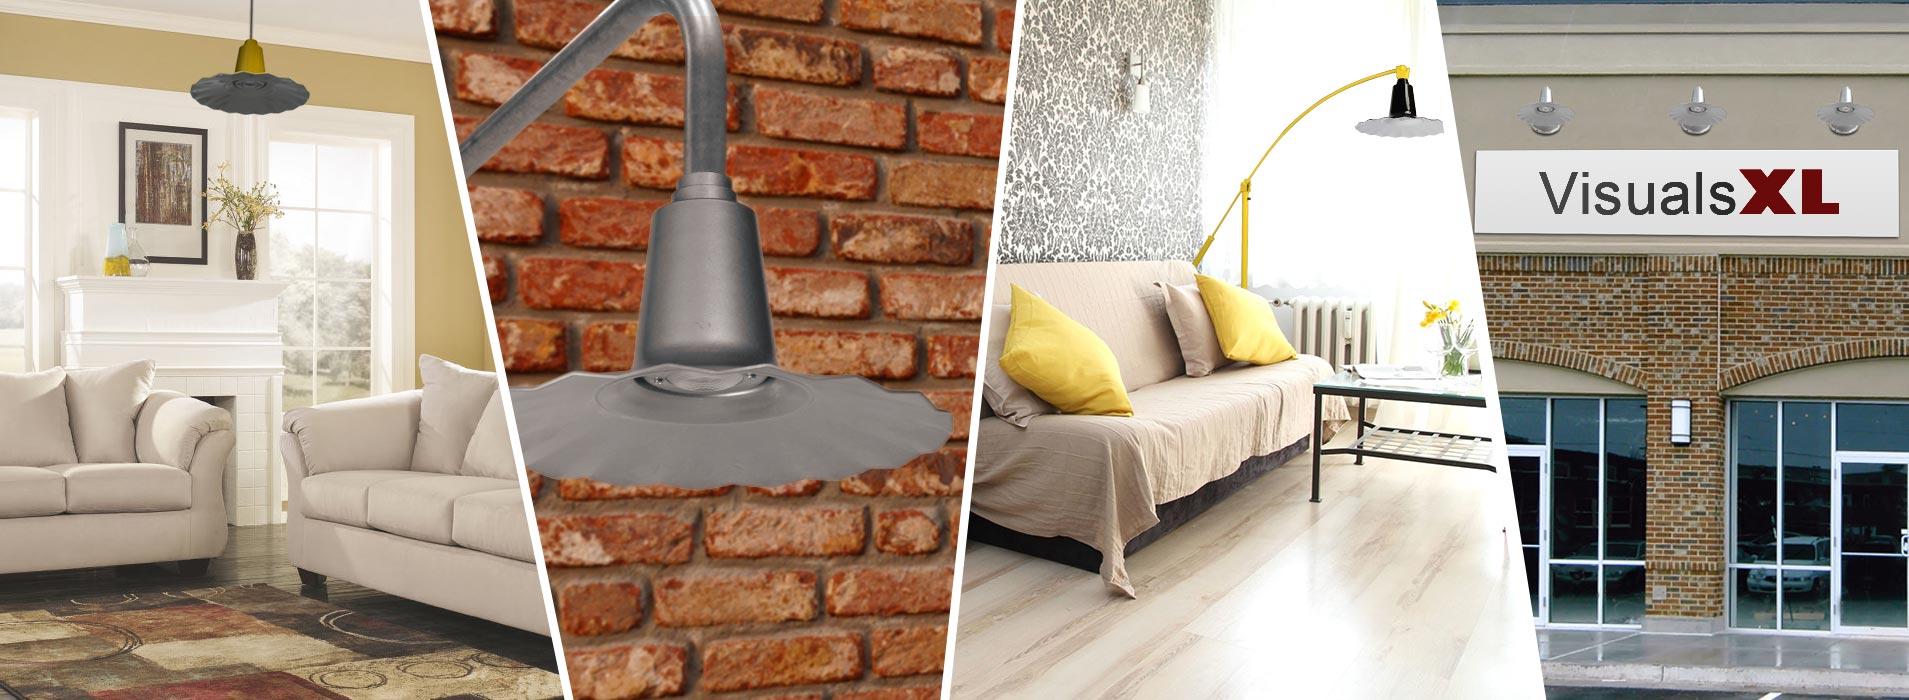 Customizable Iris Floor Lamp series